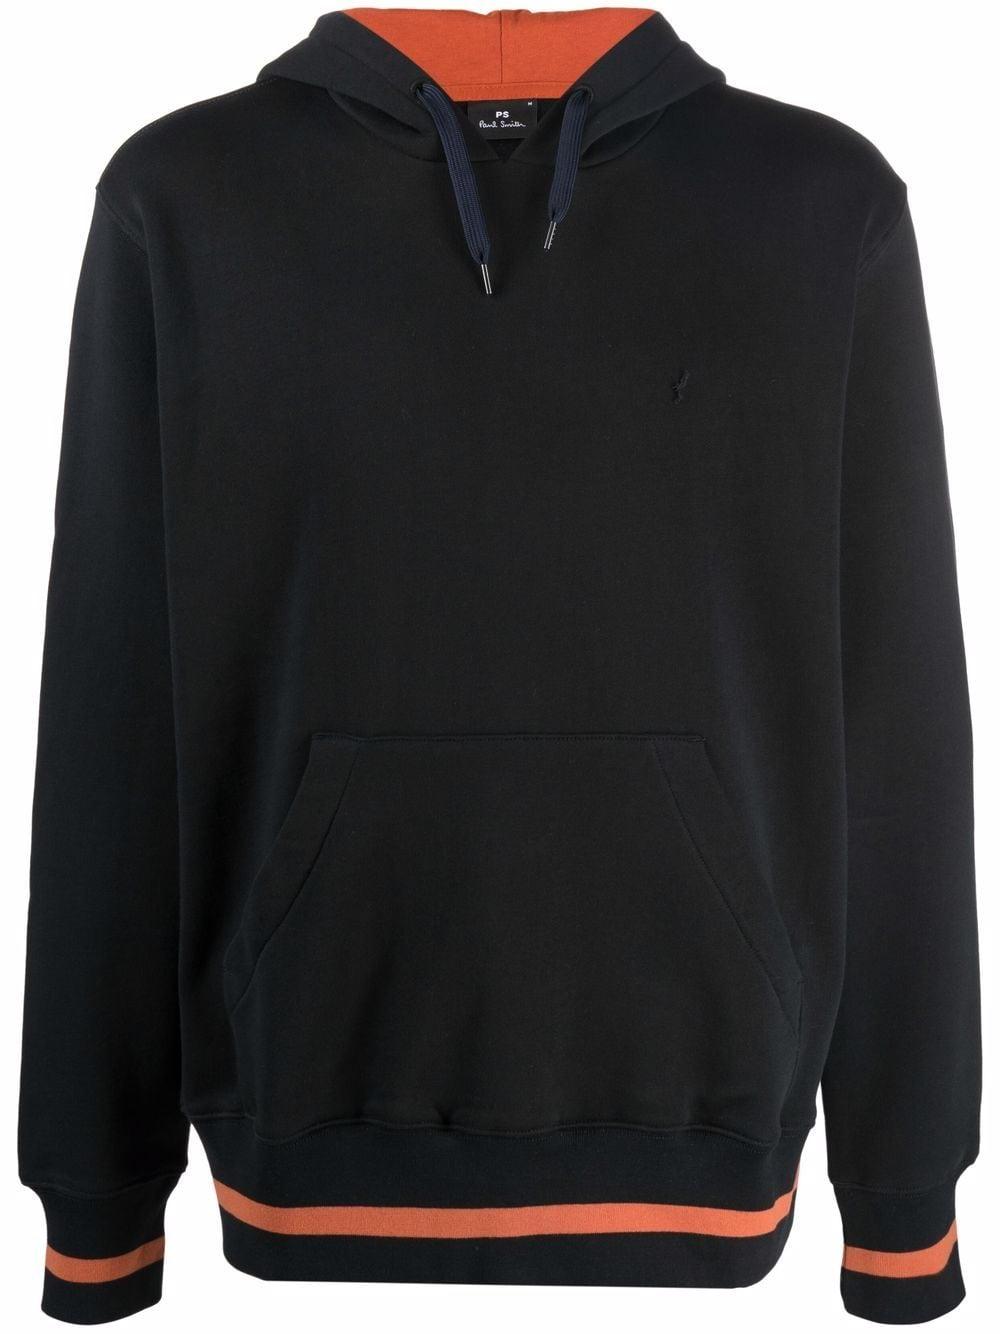 PS PAUL SMITH- Paul Smith Sweaters Black- Man- M - Black